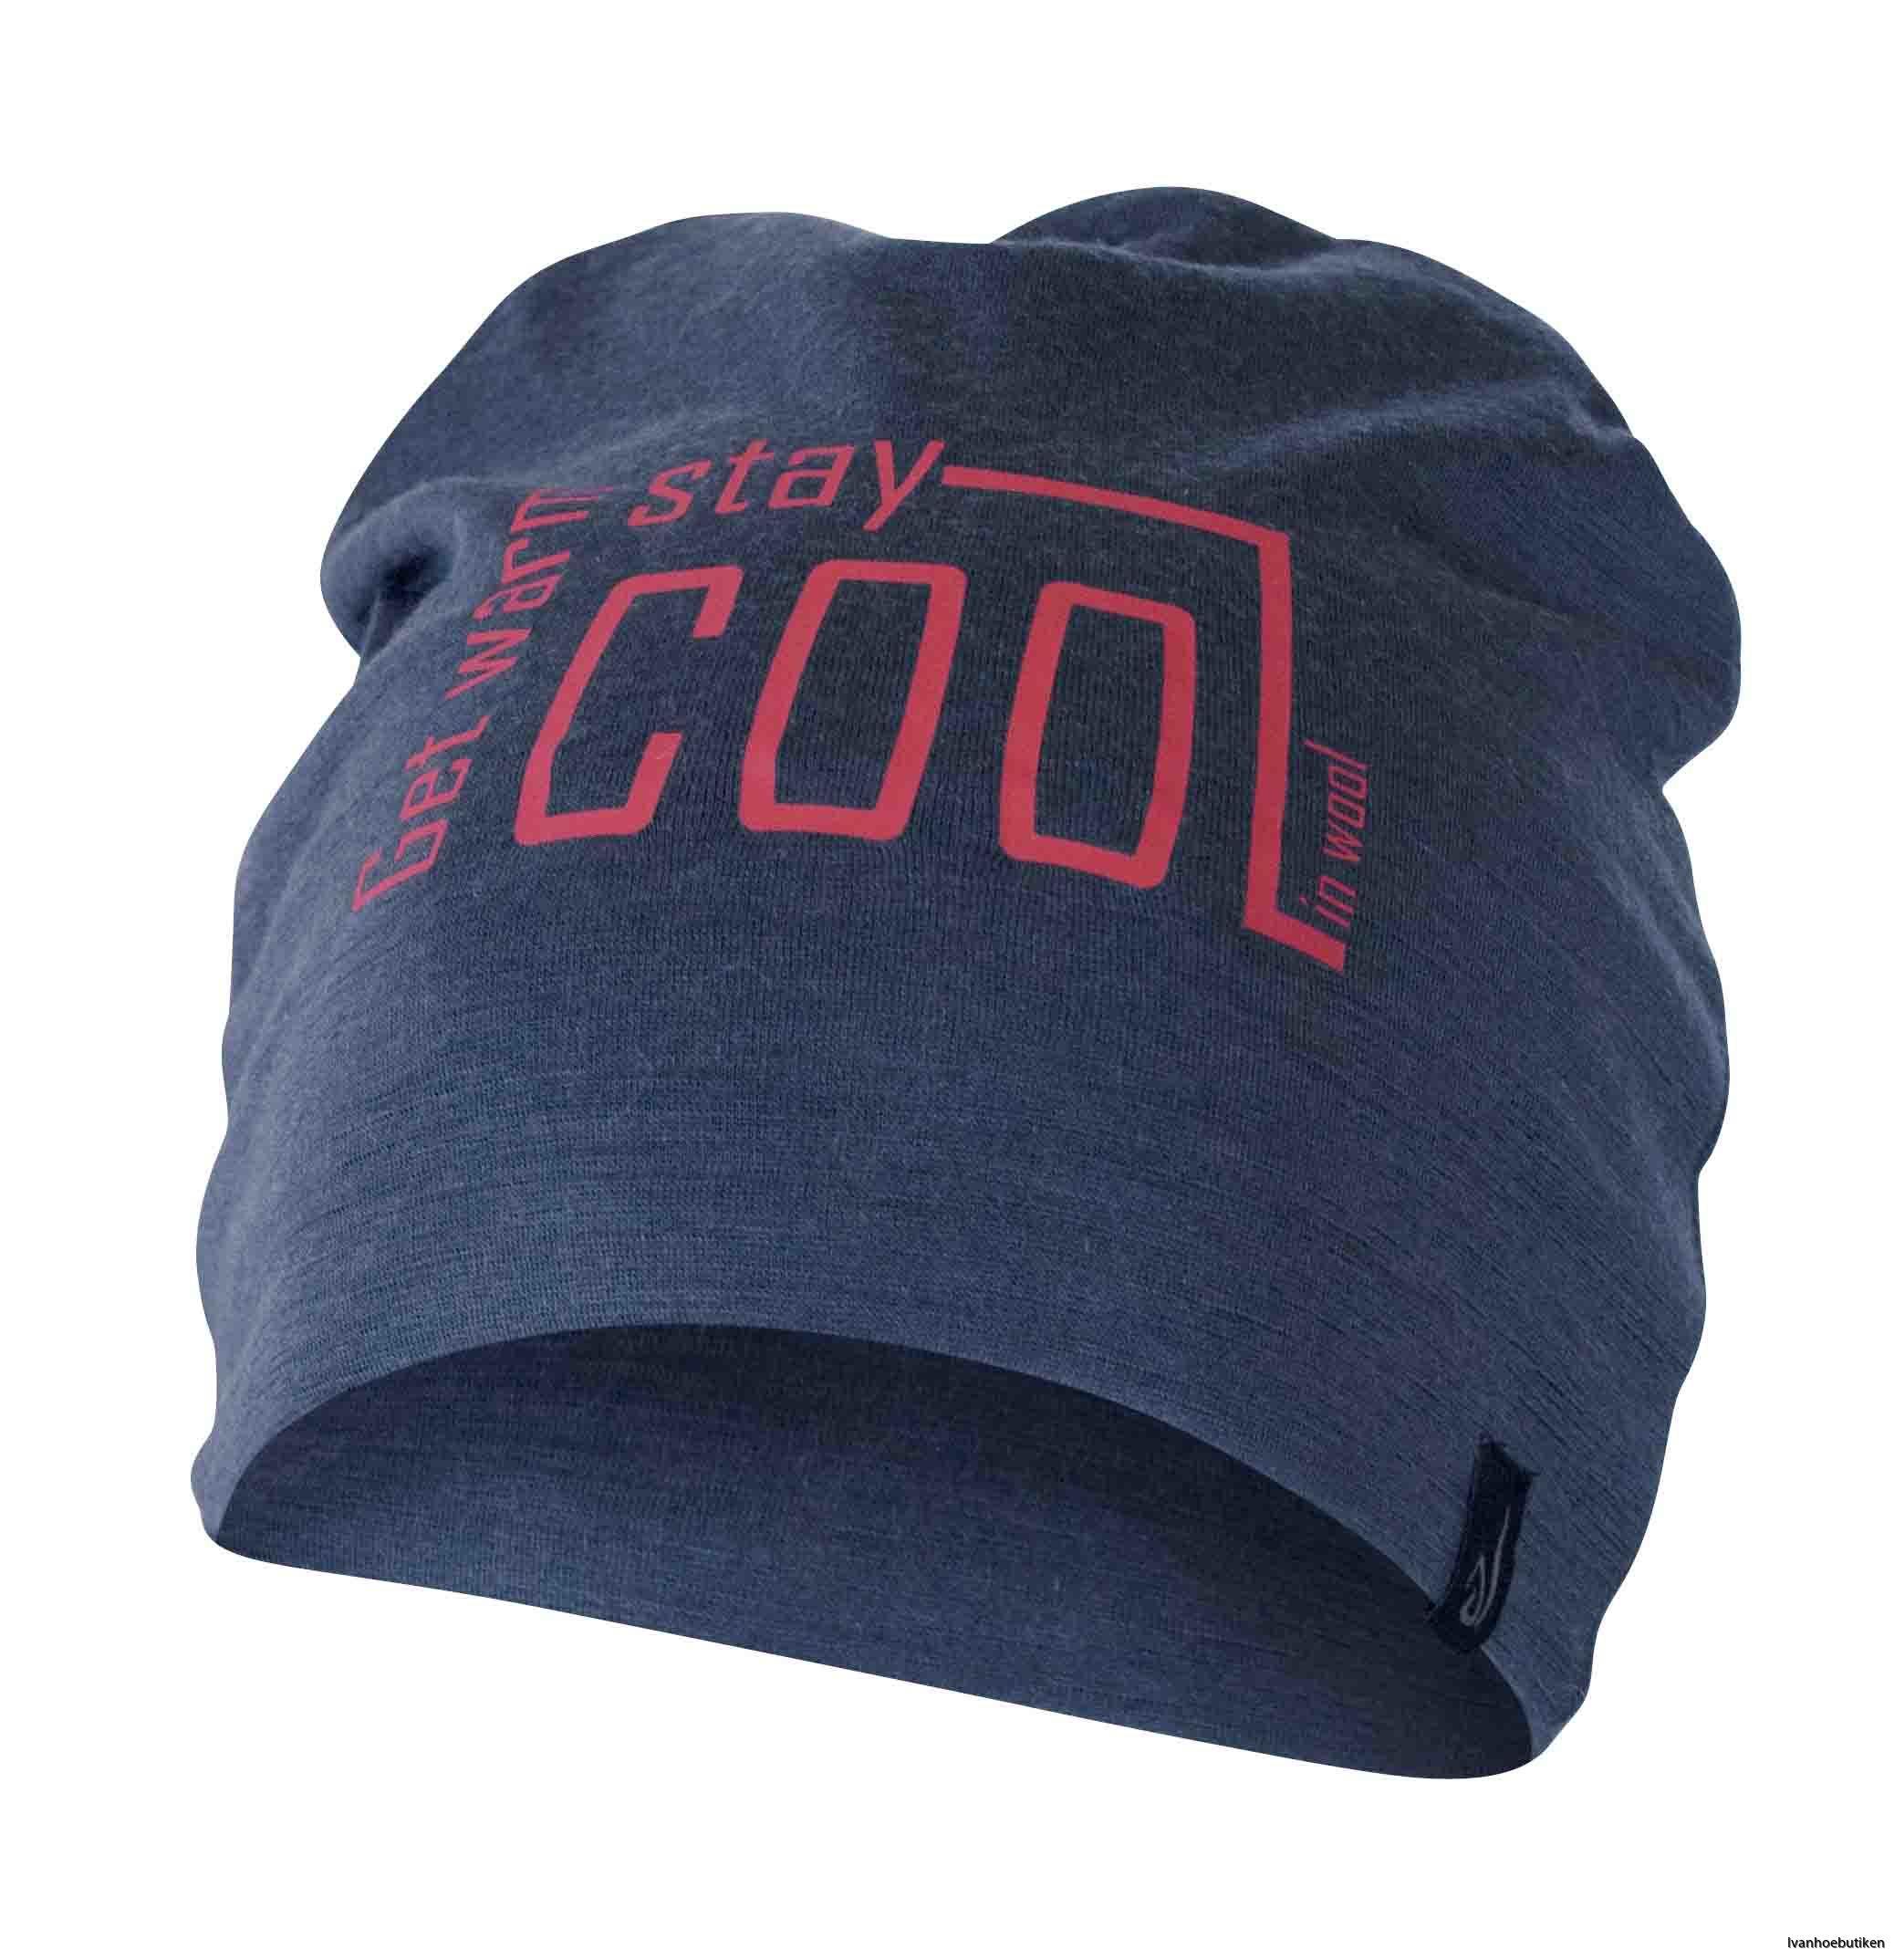 UW_Hat_Stay_Cool_617